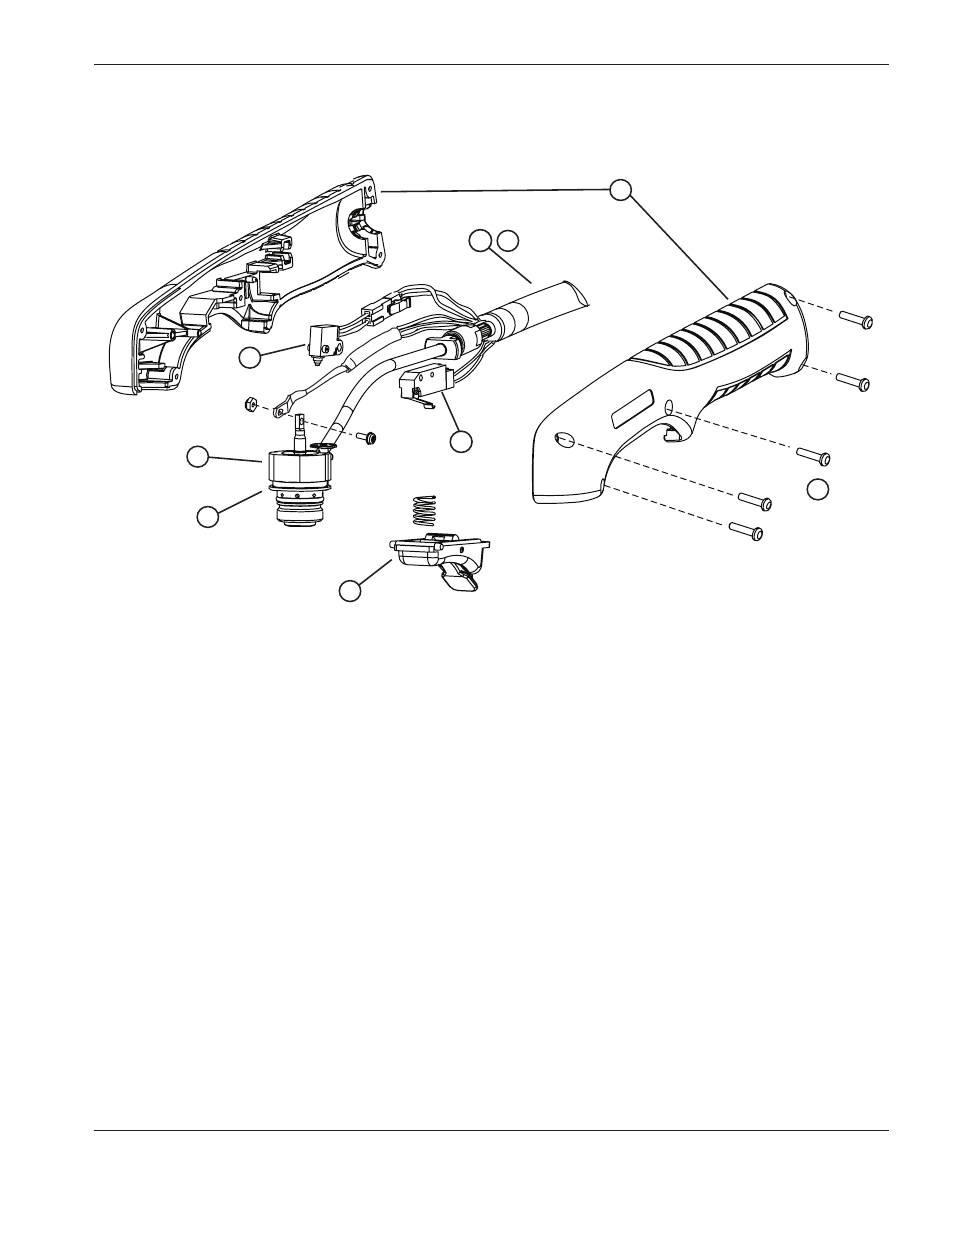 T45v Hand Torch Parts  T45v Hand Torch Parts